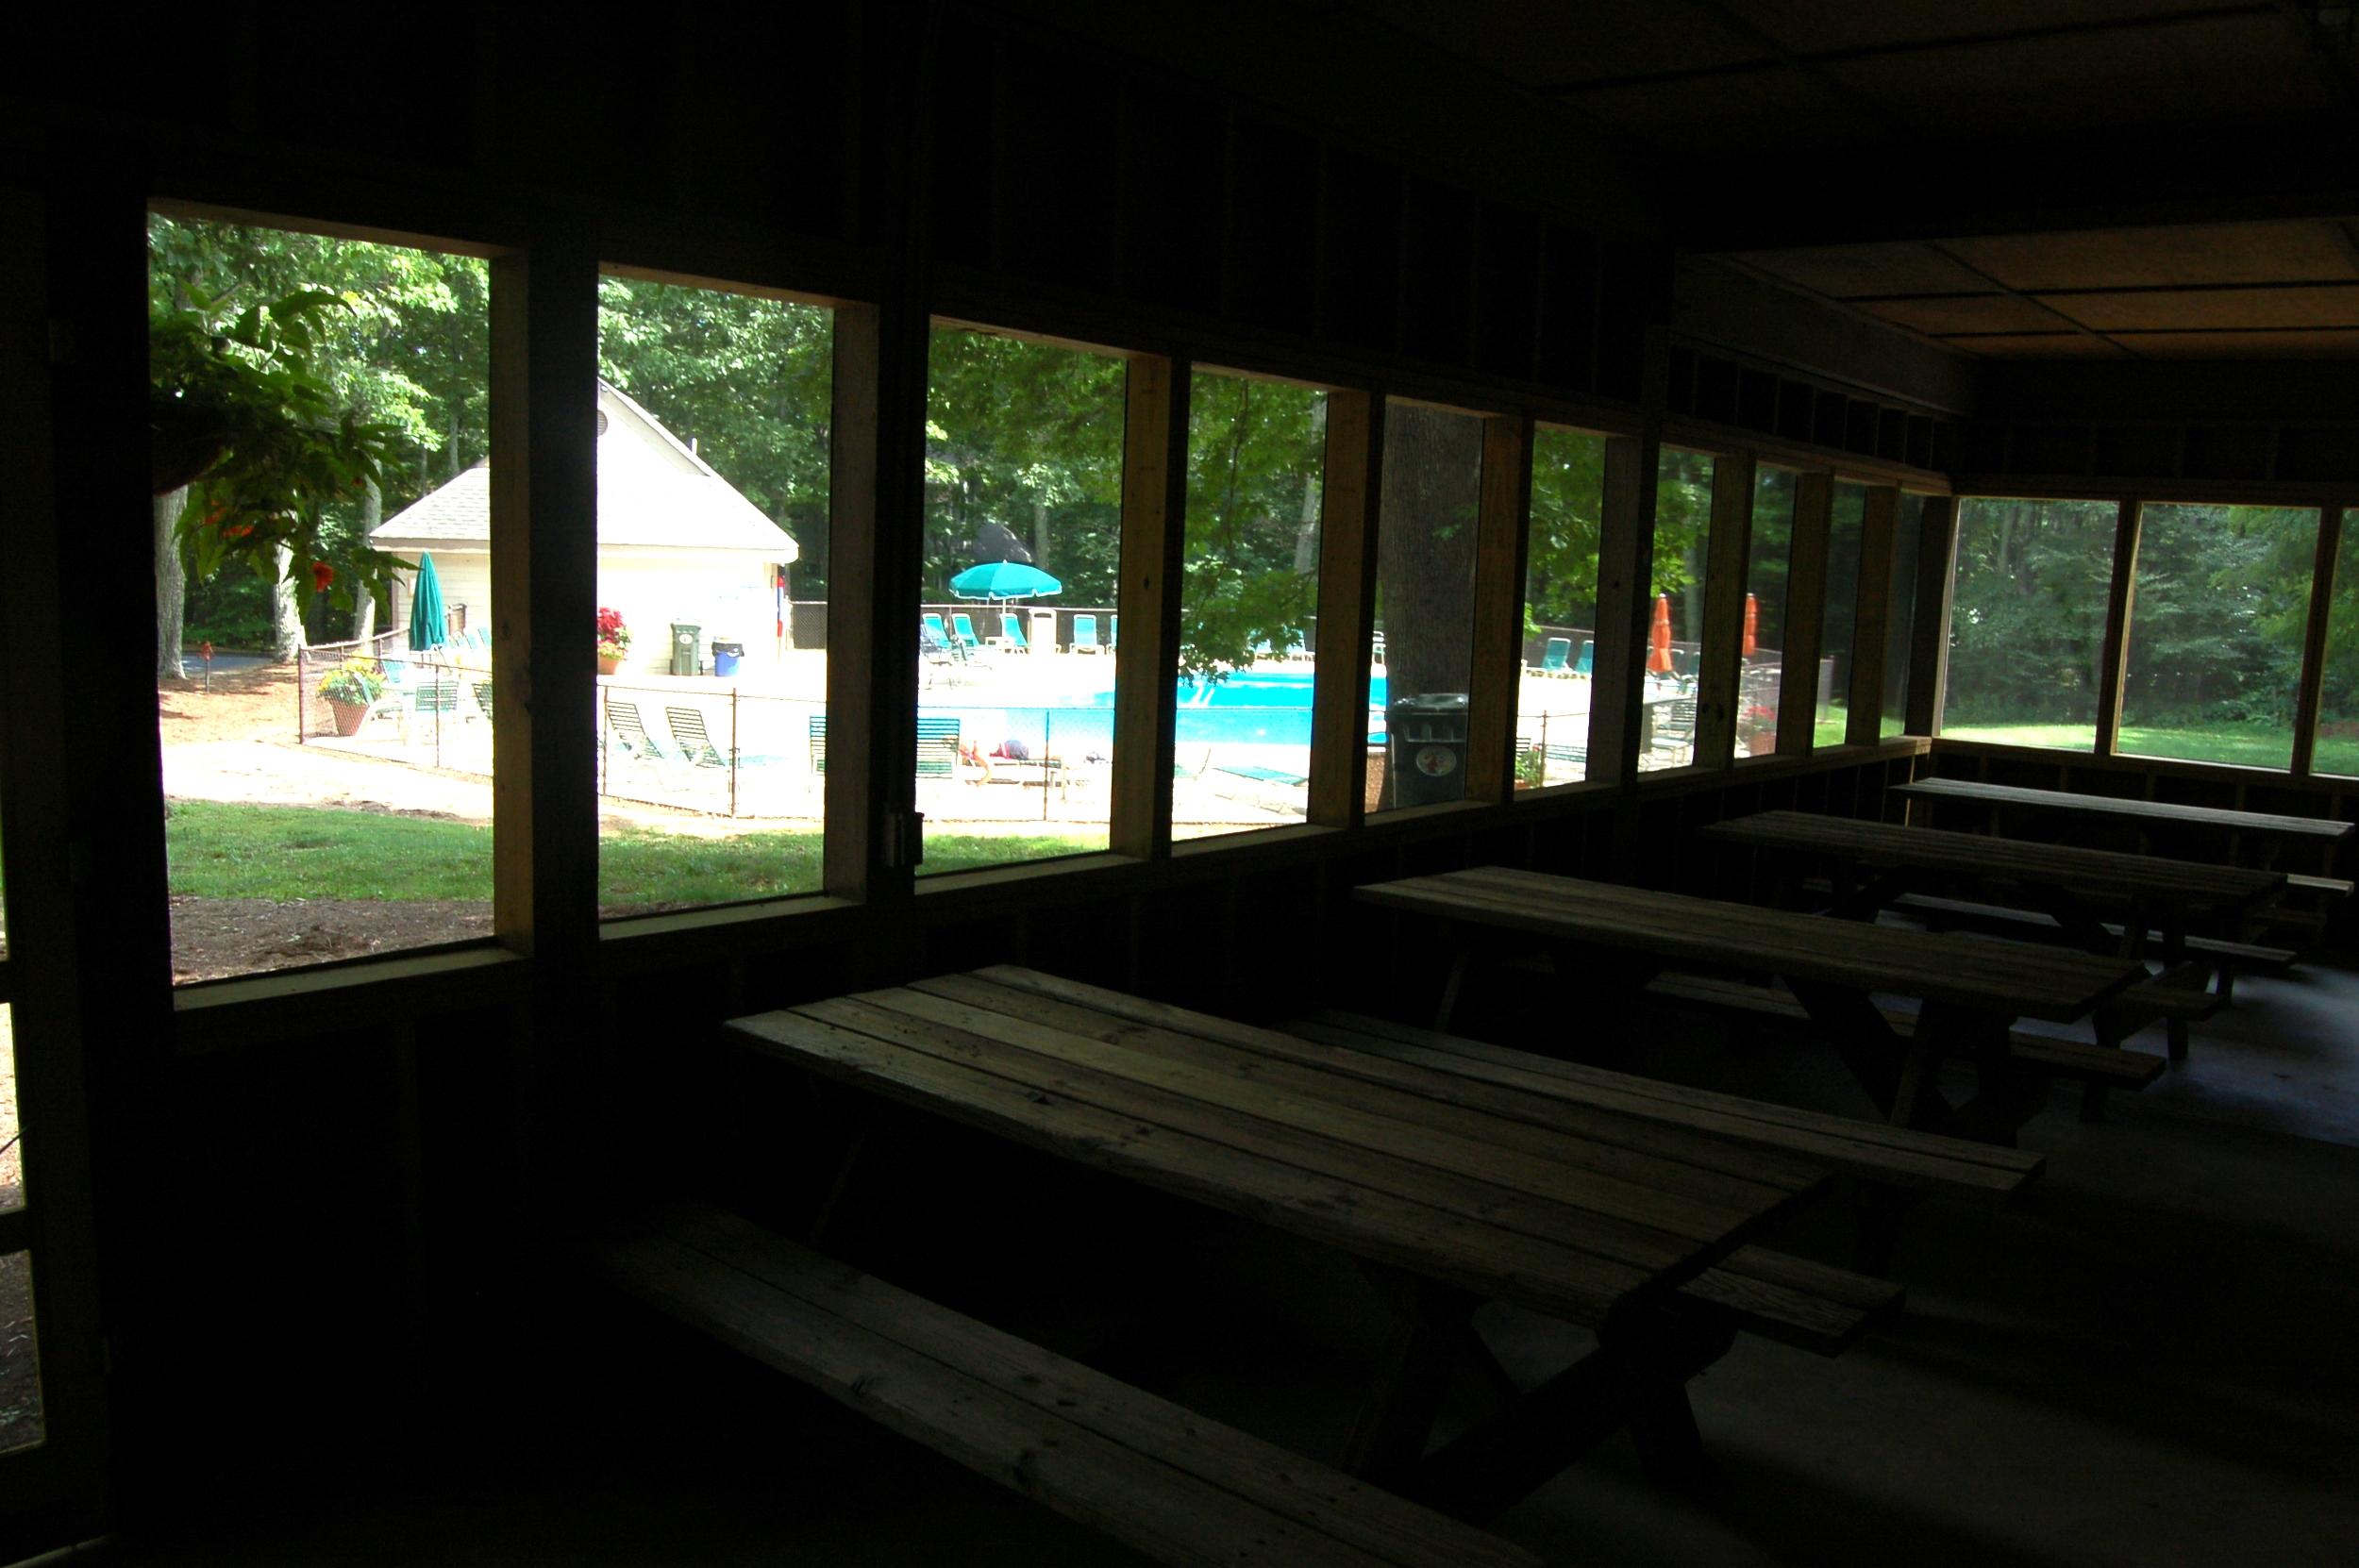 Chestnut Springs Pool & Pavilion